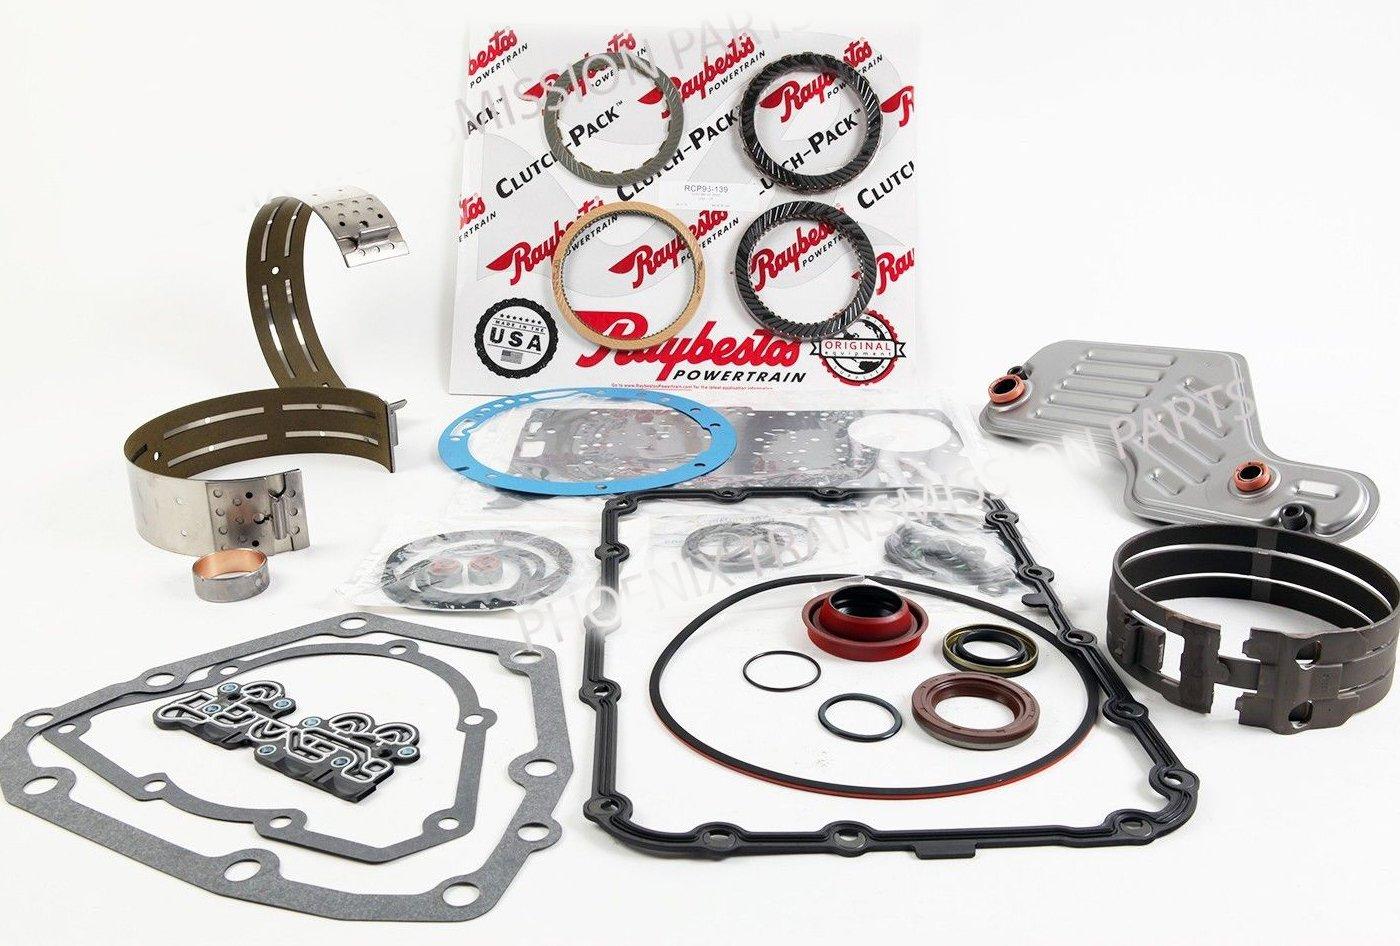 Ford 5R55W 5R55S Transmission Rebuild Kit 2002-2008 Raybestos Toledo Trans Kit